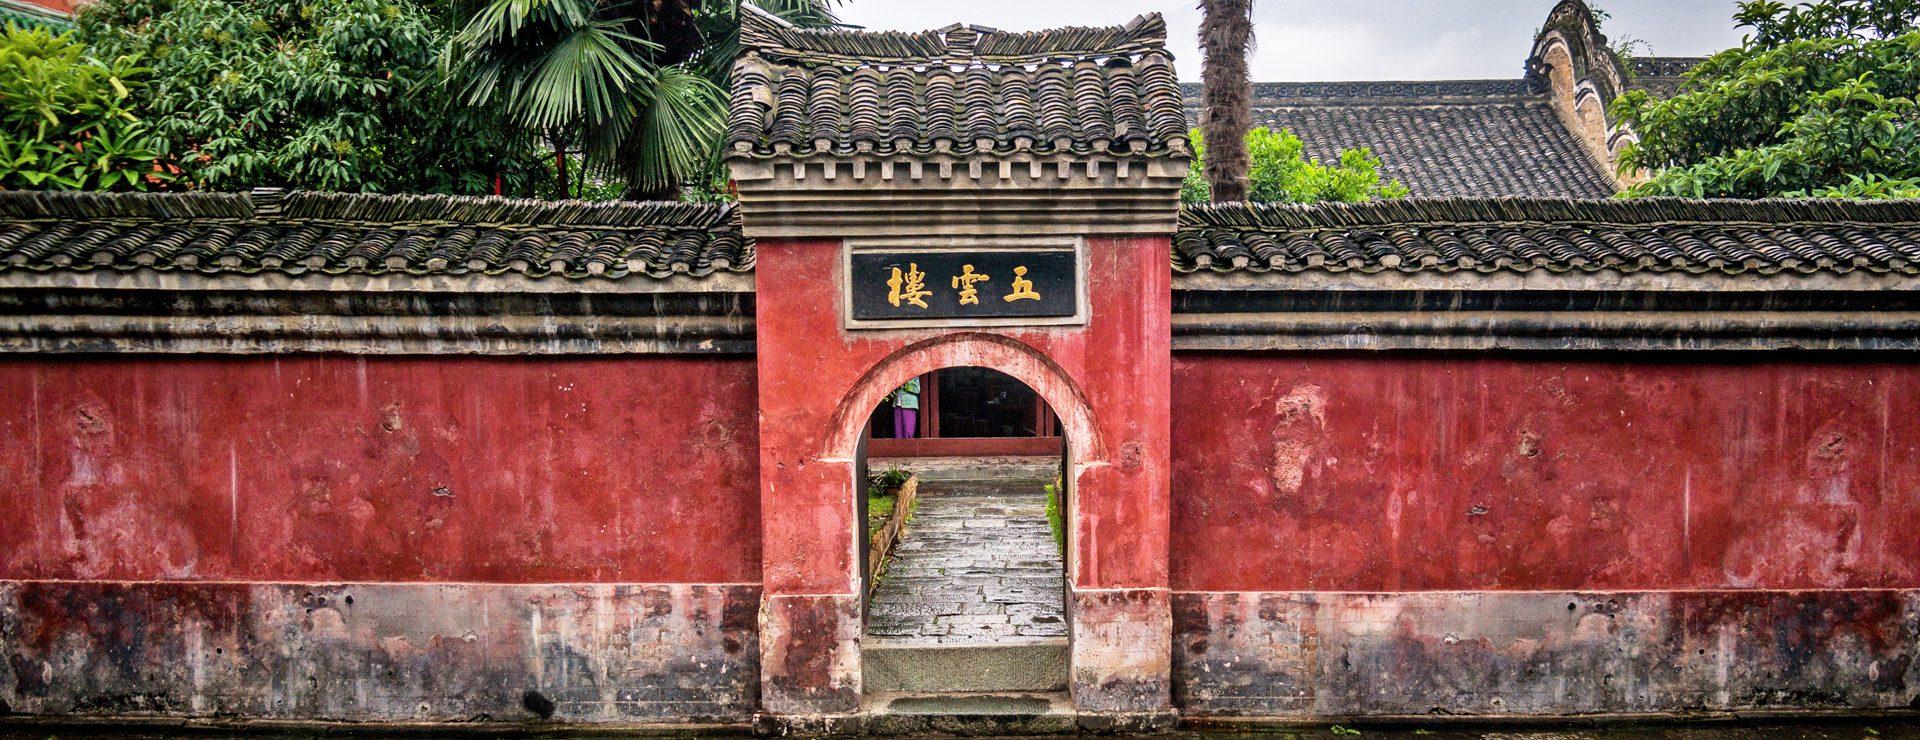 Wudangshans tempel